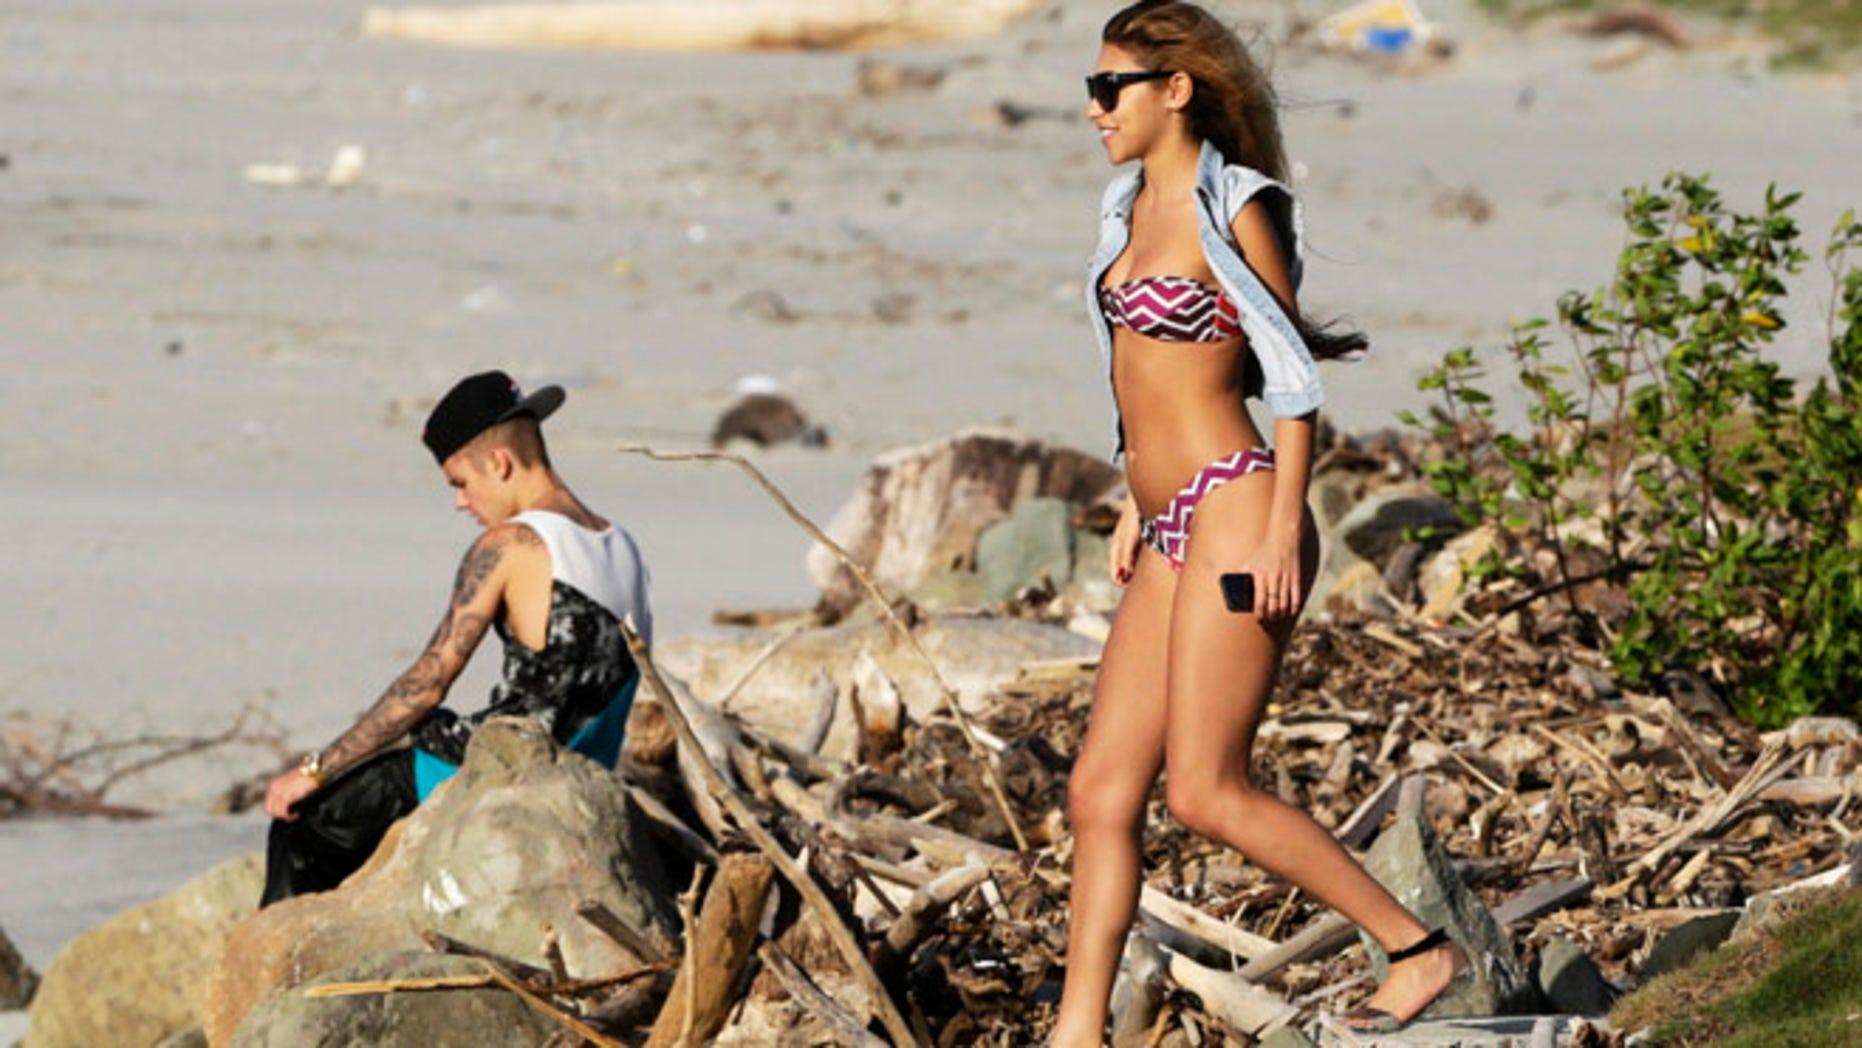 Chantel Jeffries and Justin Bieber on the outskirts of Panama City.